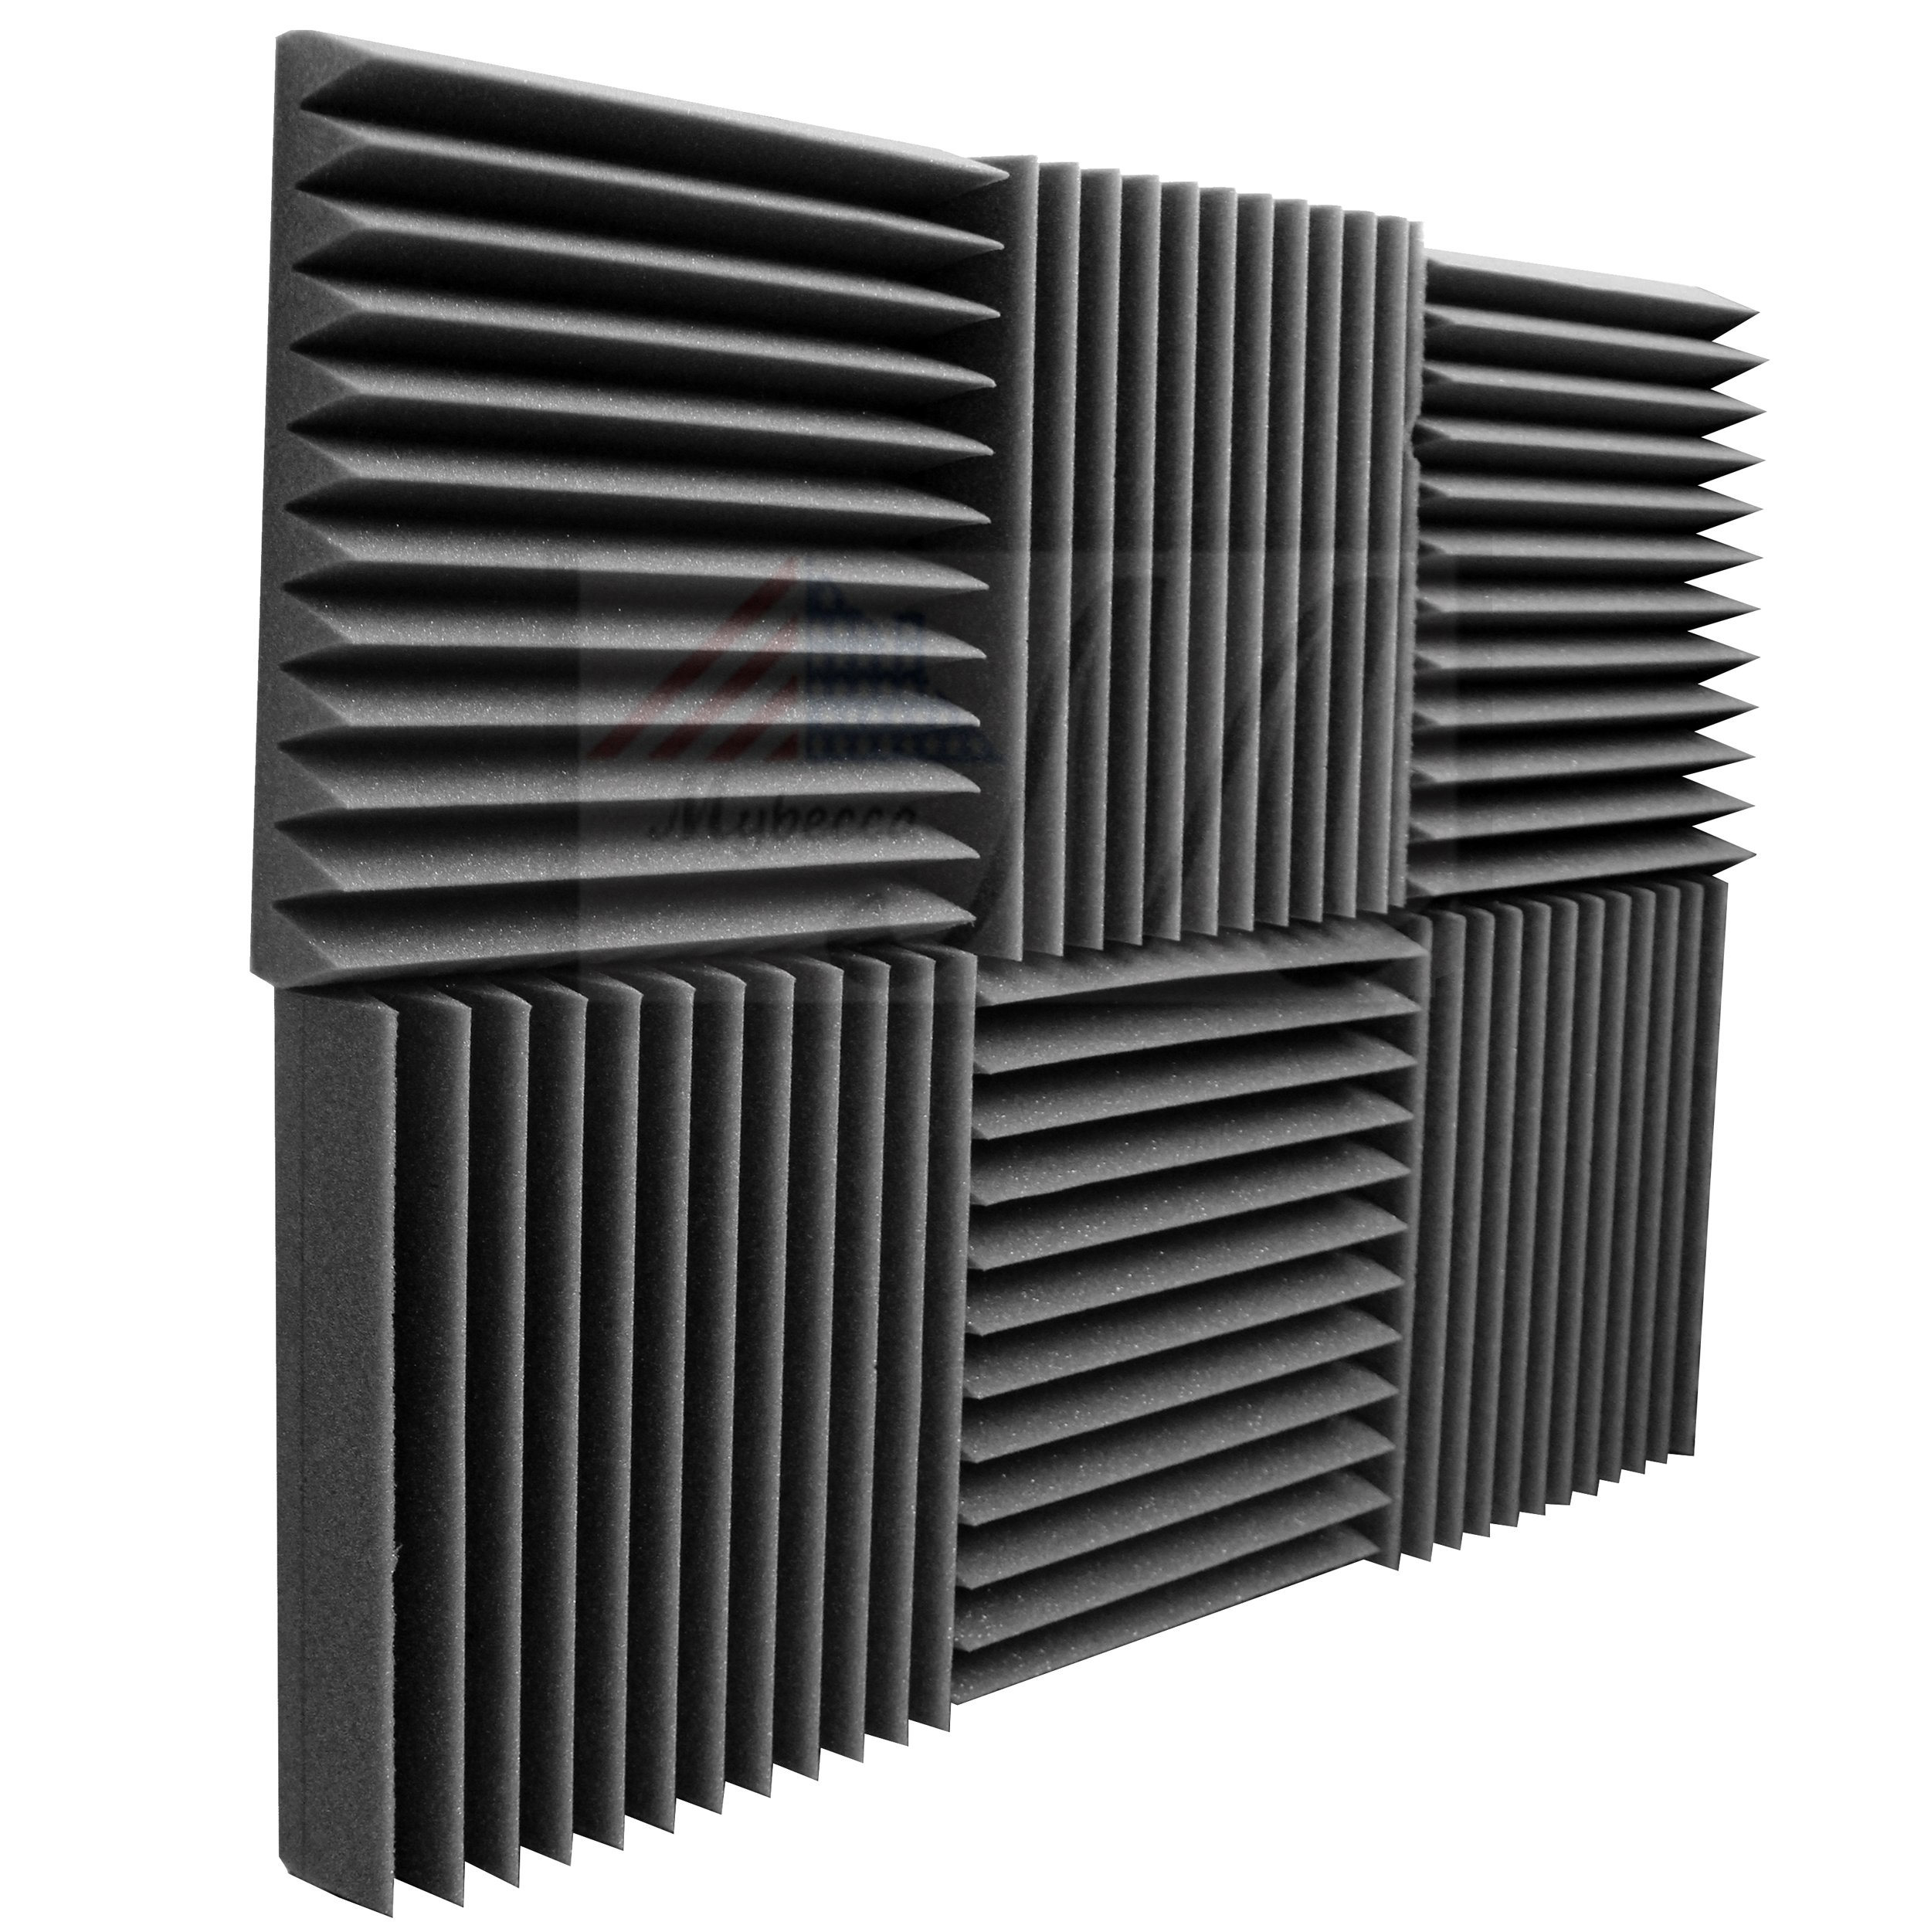 Mybecca 6 Pack Acoustic Foam Wedge 2'' X 12'' X 12'' Studio Soundproofing Panels (6 Square Feet), Charcoal